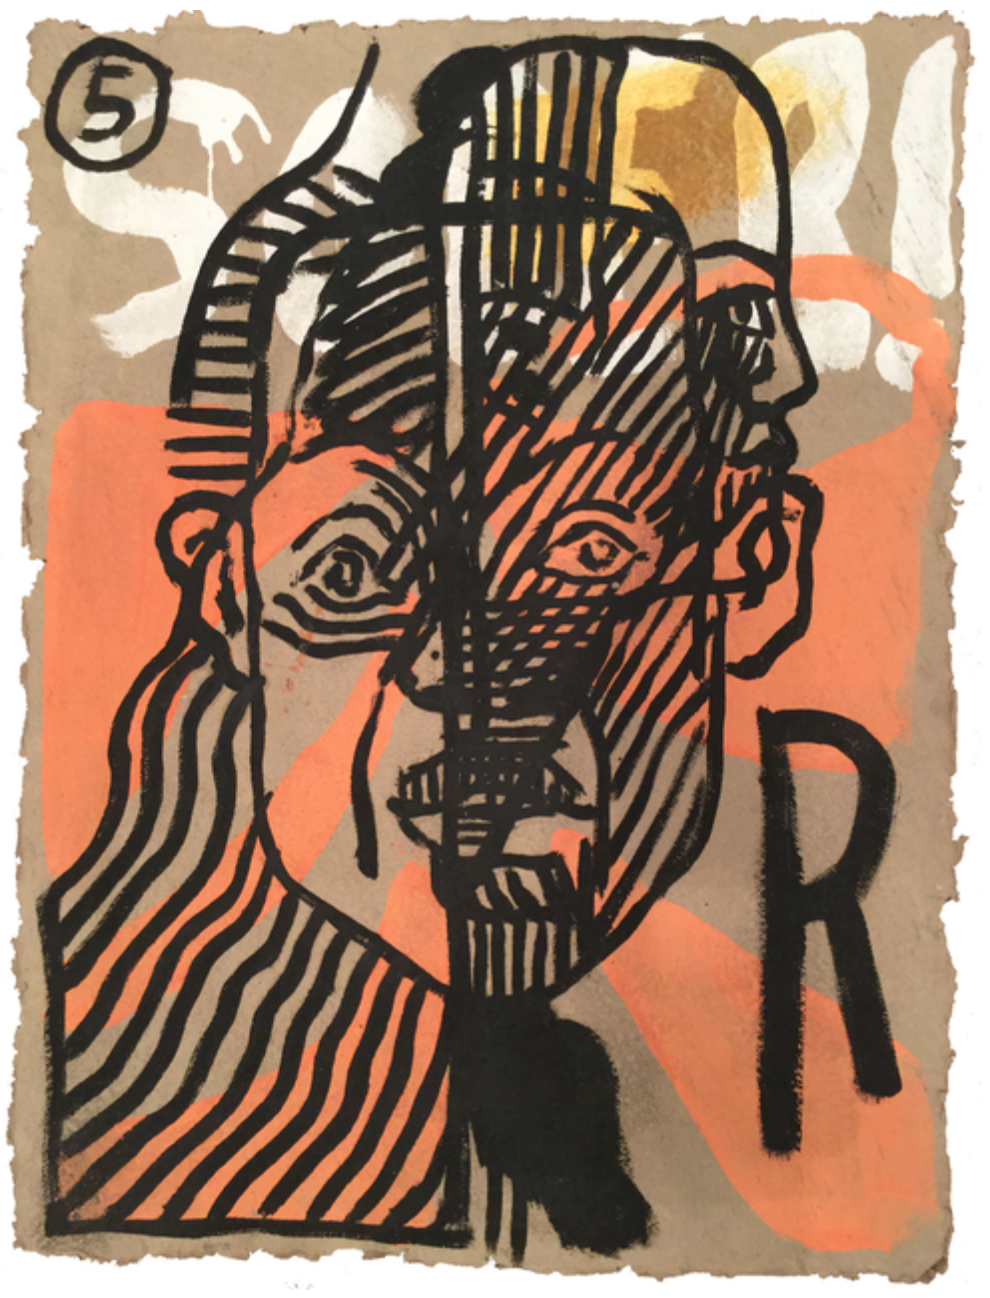 Portrait Series No.5, Francisco Vidal GALLERY: Tiwani Contemporary